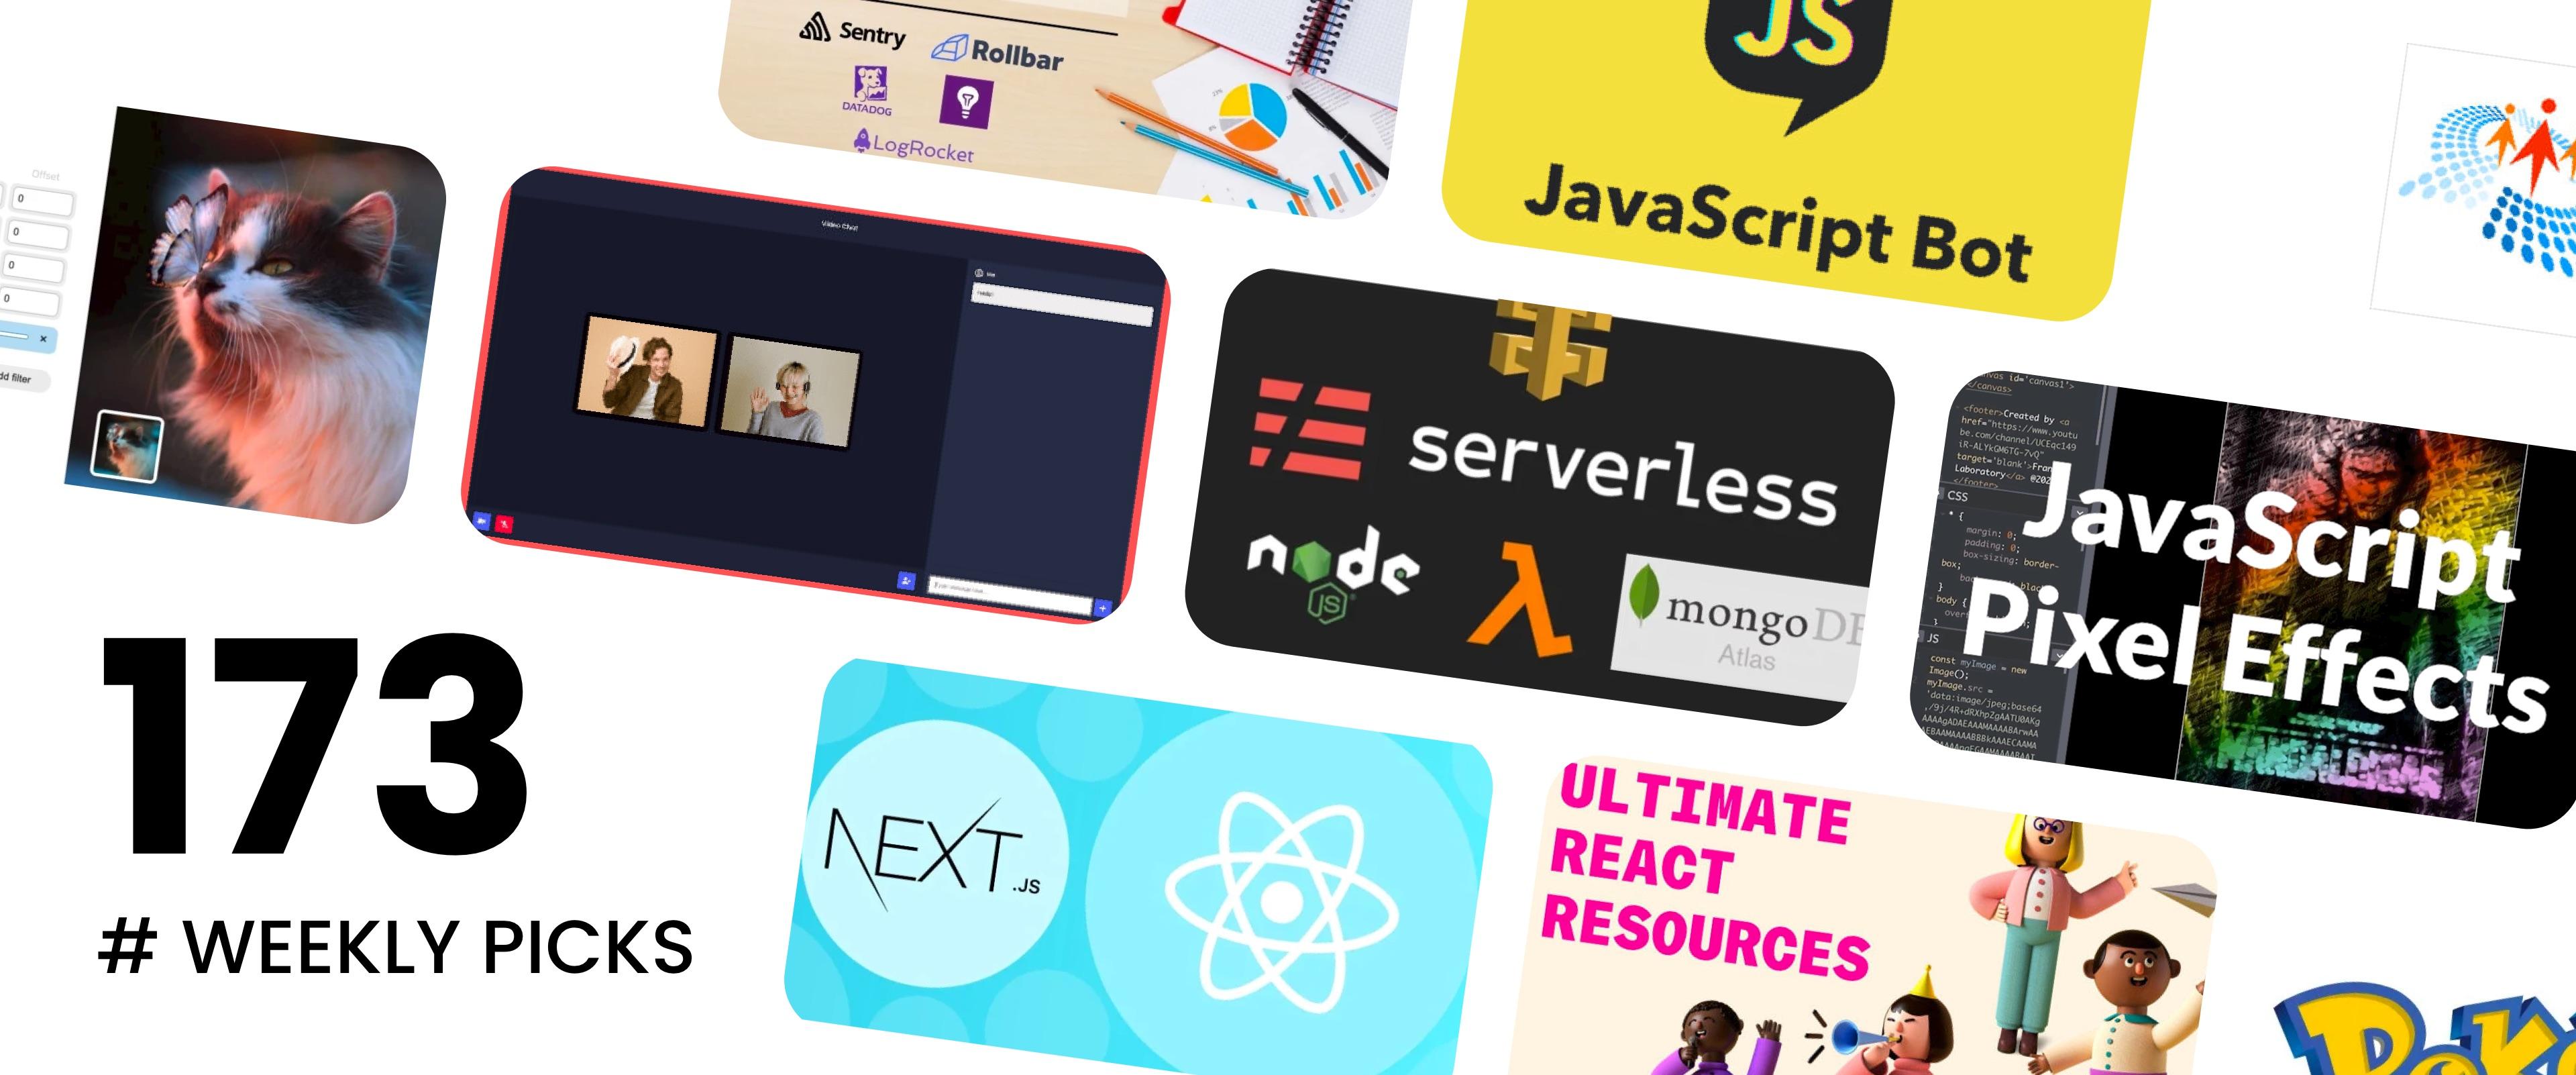 JavaScript Bot, SVG Generators, Building a Video Chat App - Picks #173